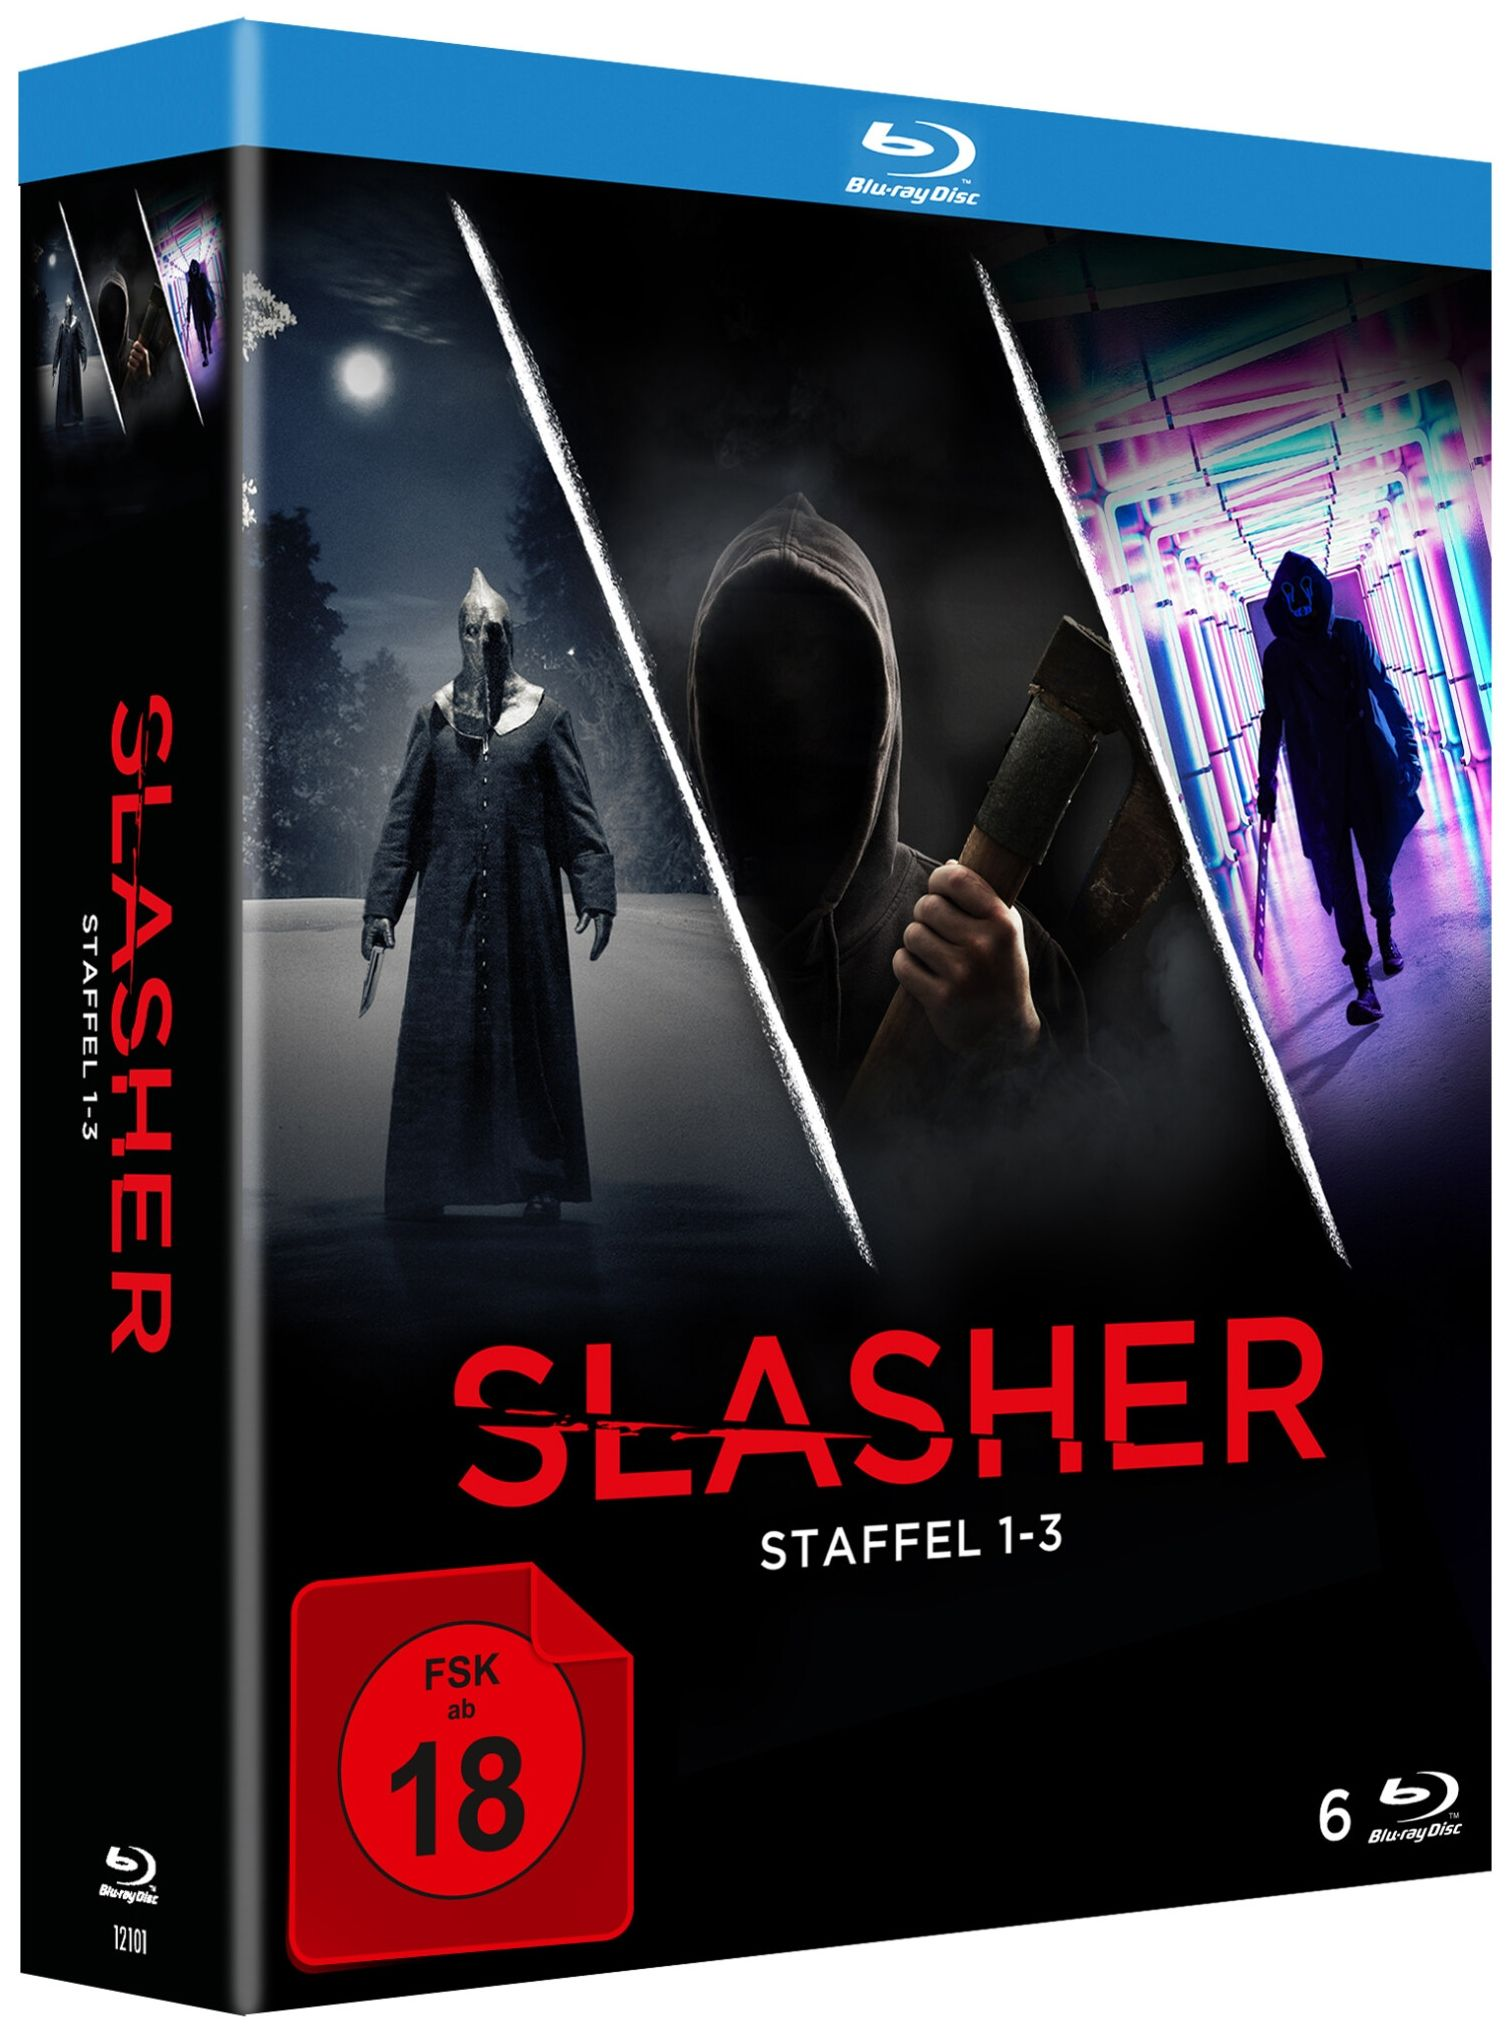 Slasher - Staffel 1-3 (6 Discs) (BLURAY)